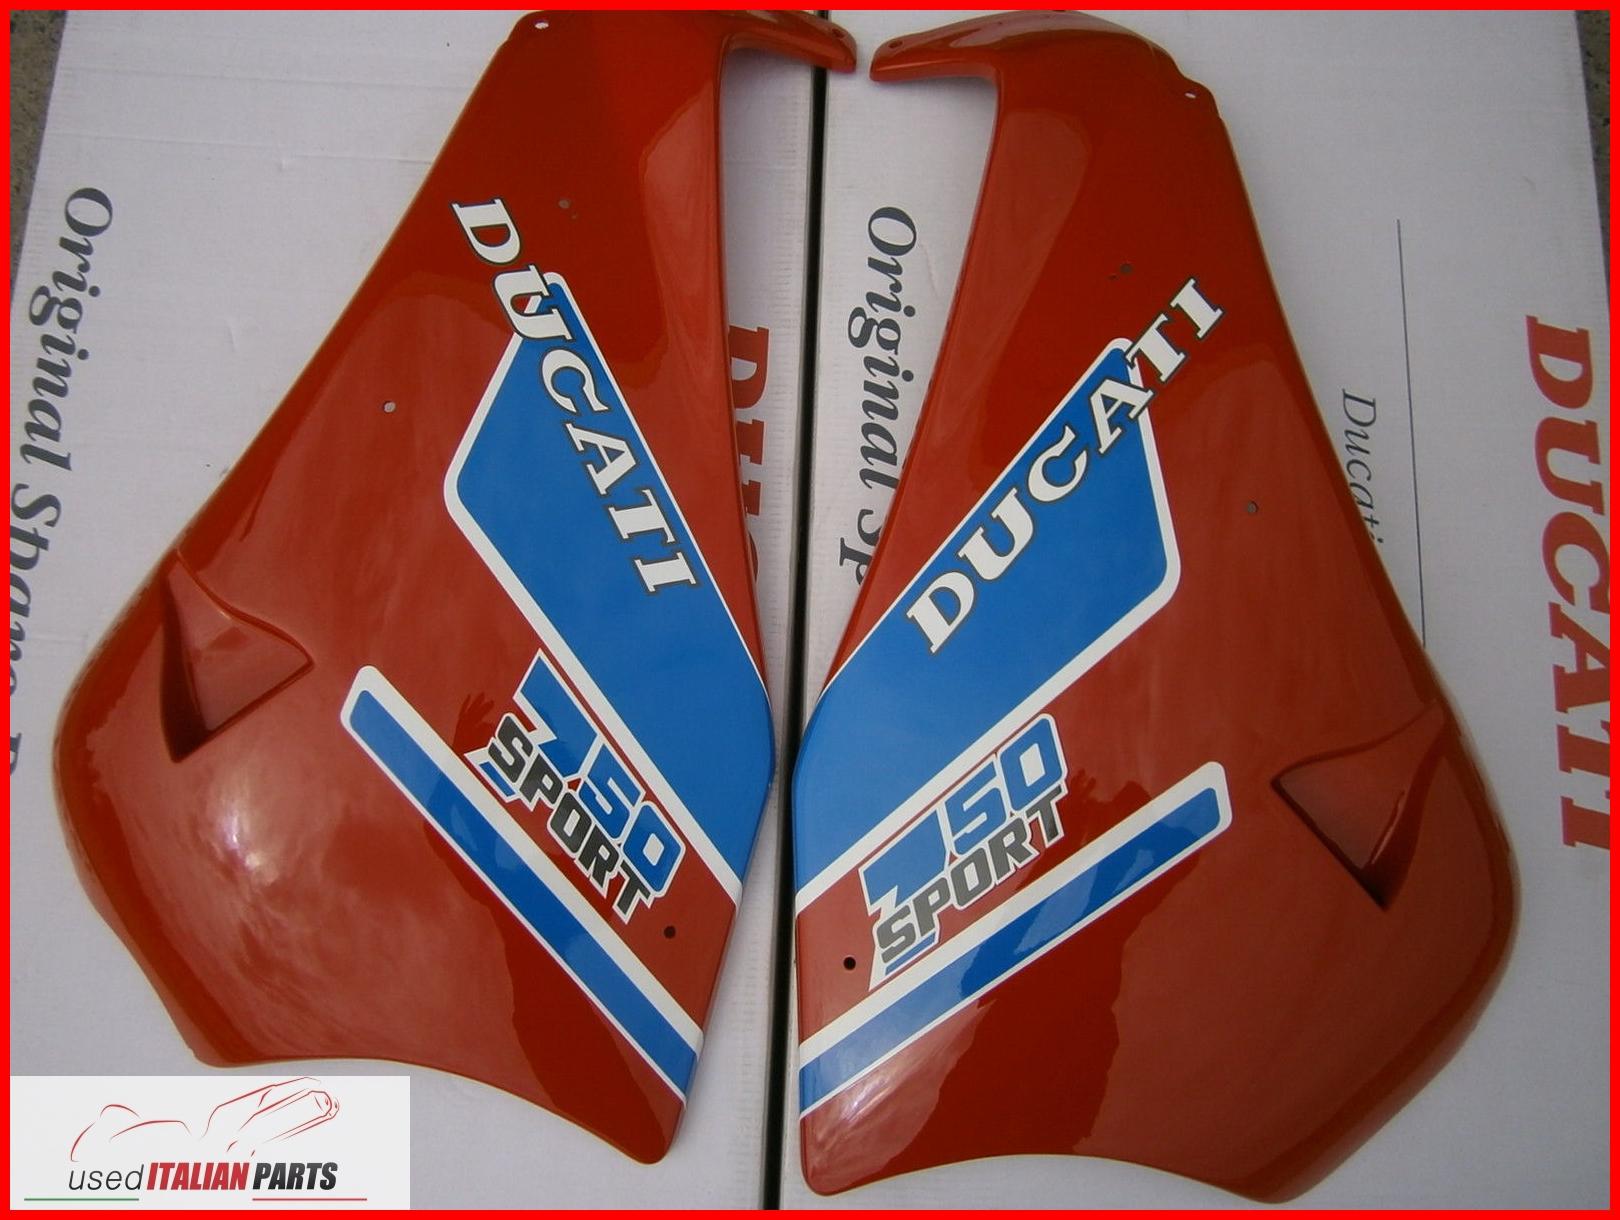 Ducati Verkleidung/Fairings